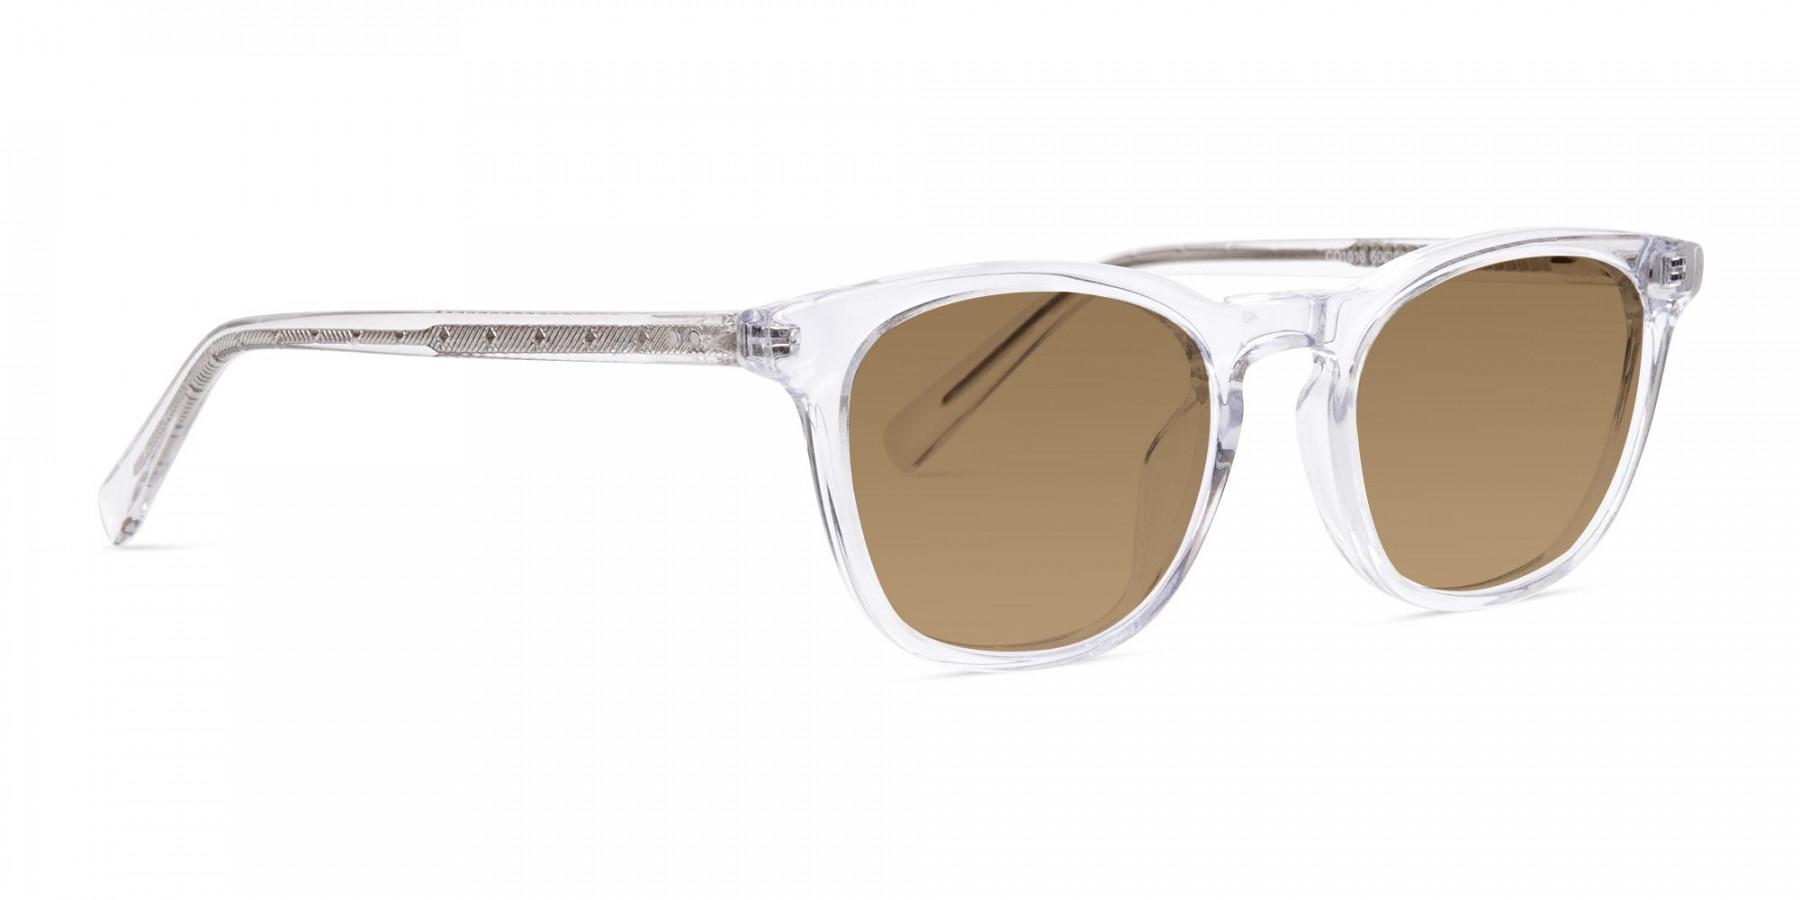 crystal-clear-or-transparent-wayfarer-brown-tinted-sunglasses-frames-3